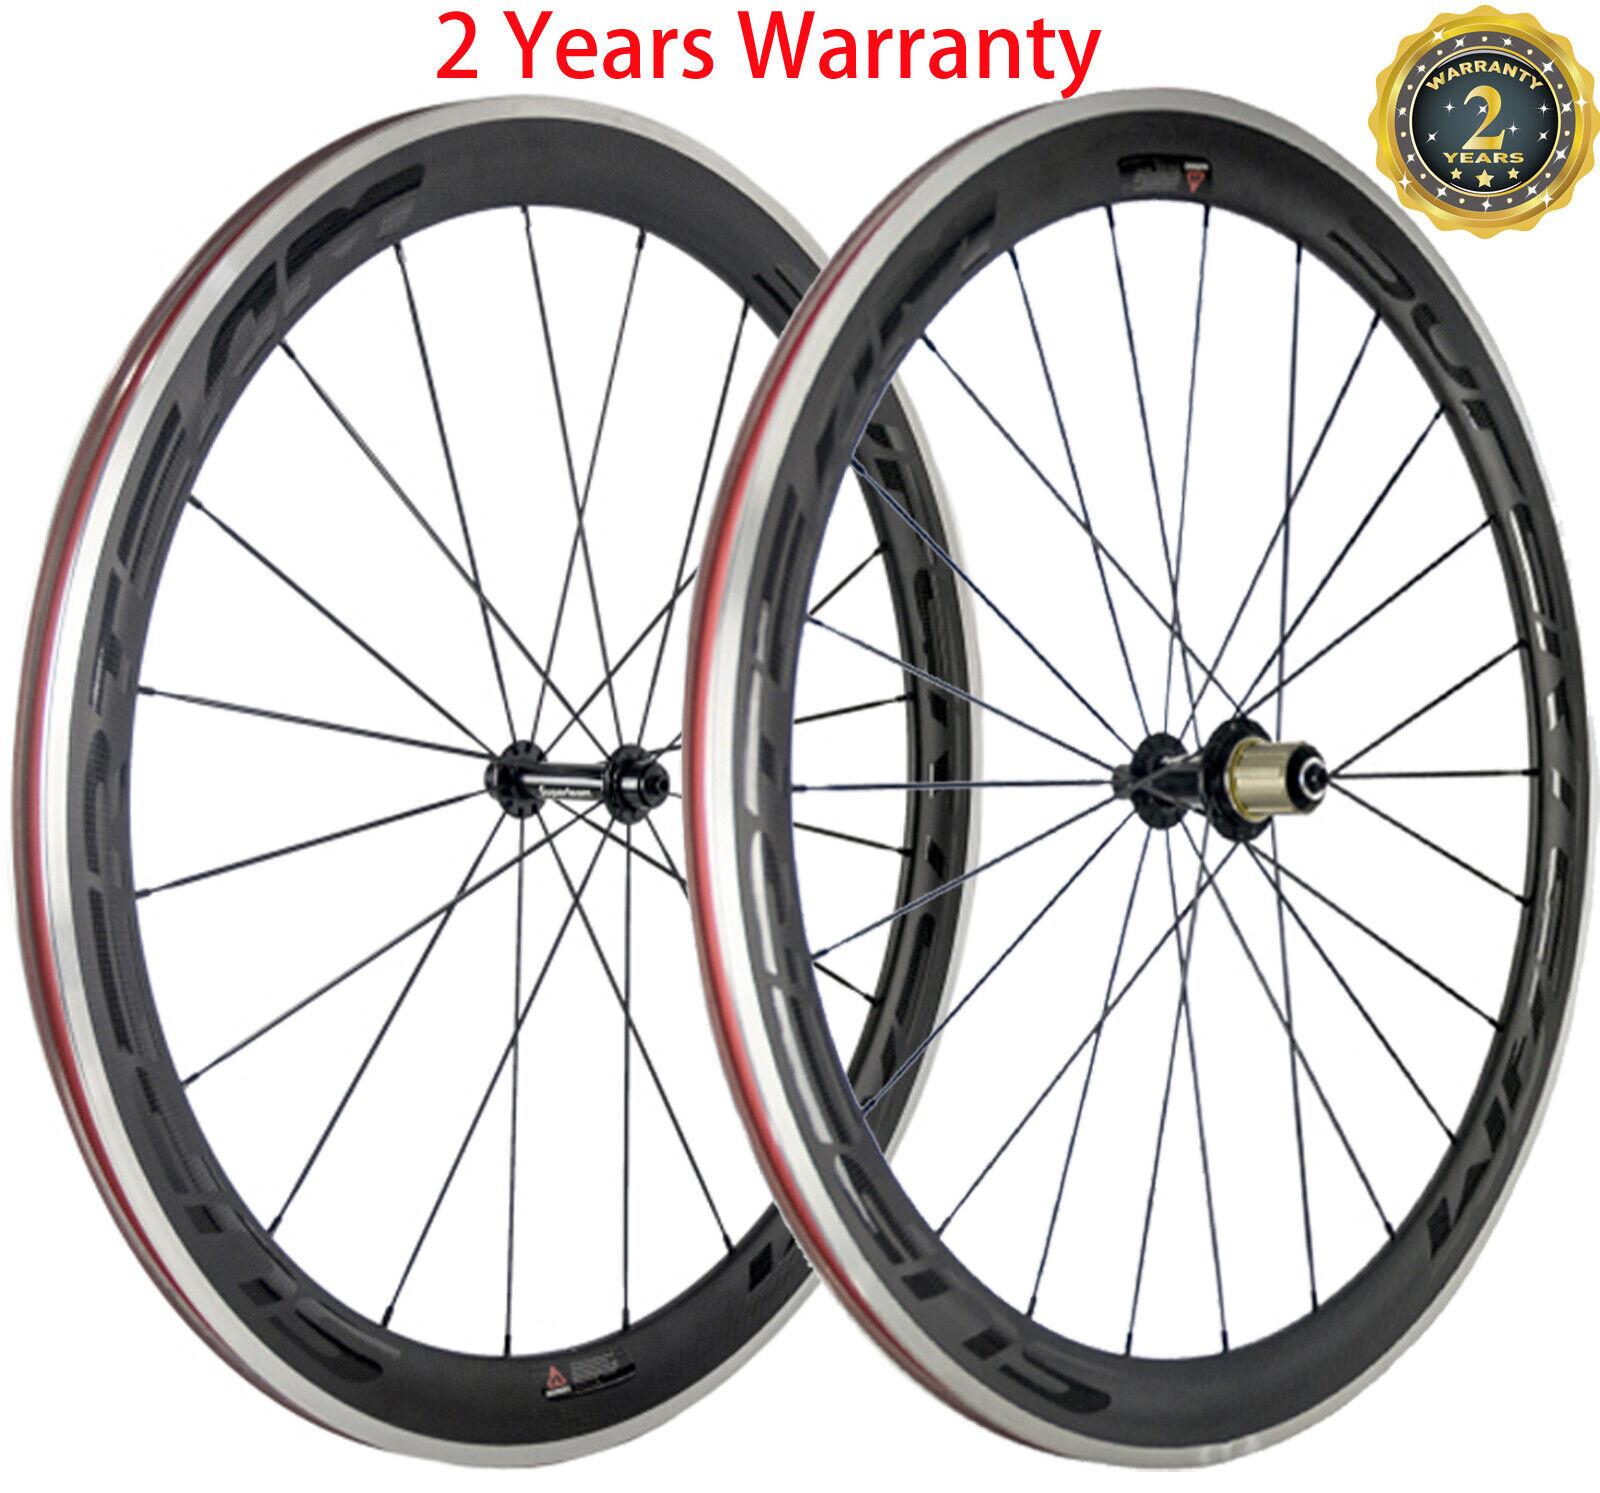 Carbon Wheels Road Bike 50mm Aluminum Brake  Surface Clincher Wheelset 700C Bike  simple and generous design